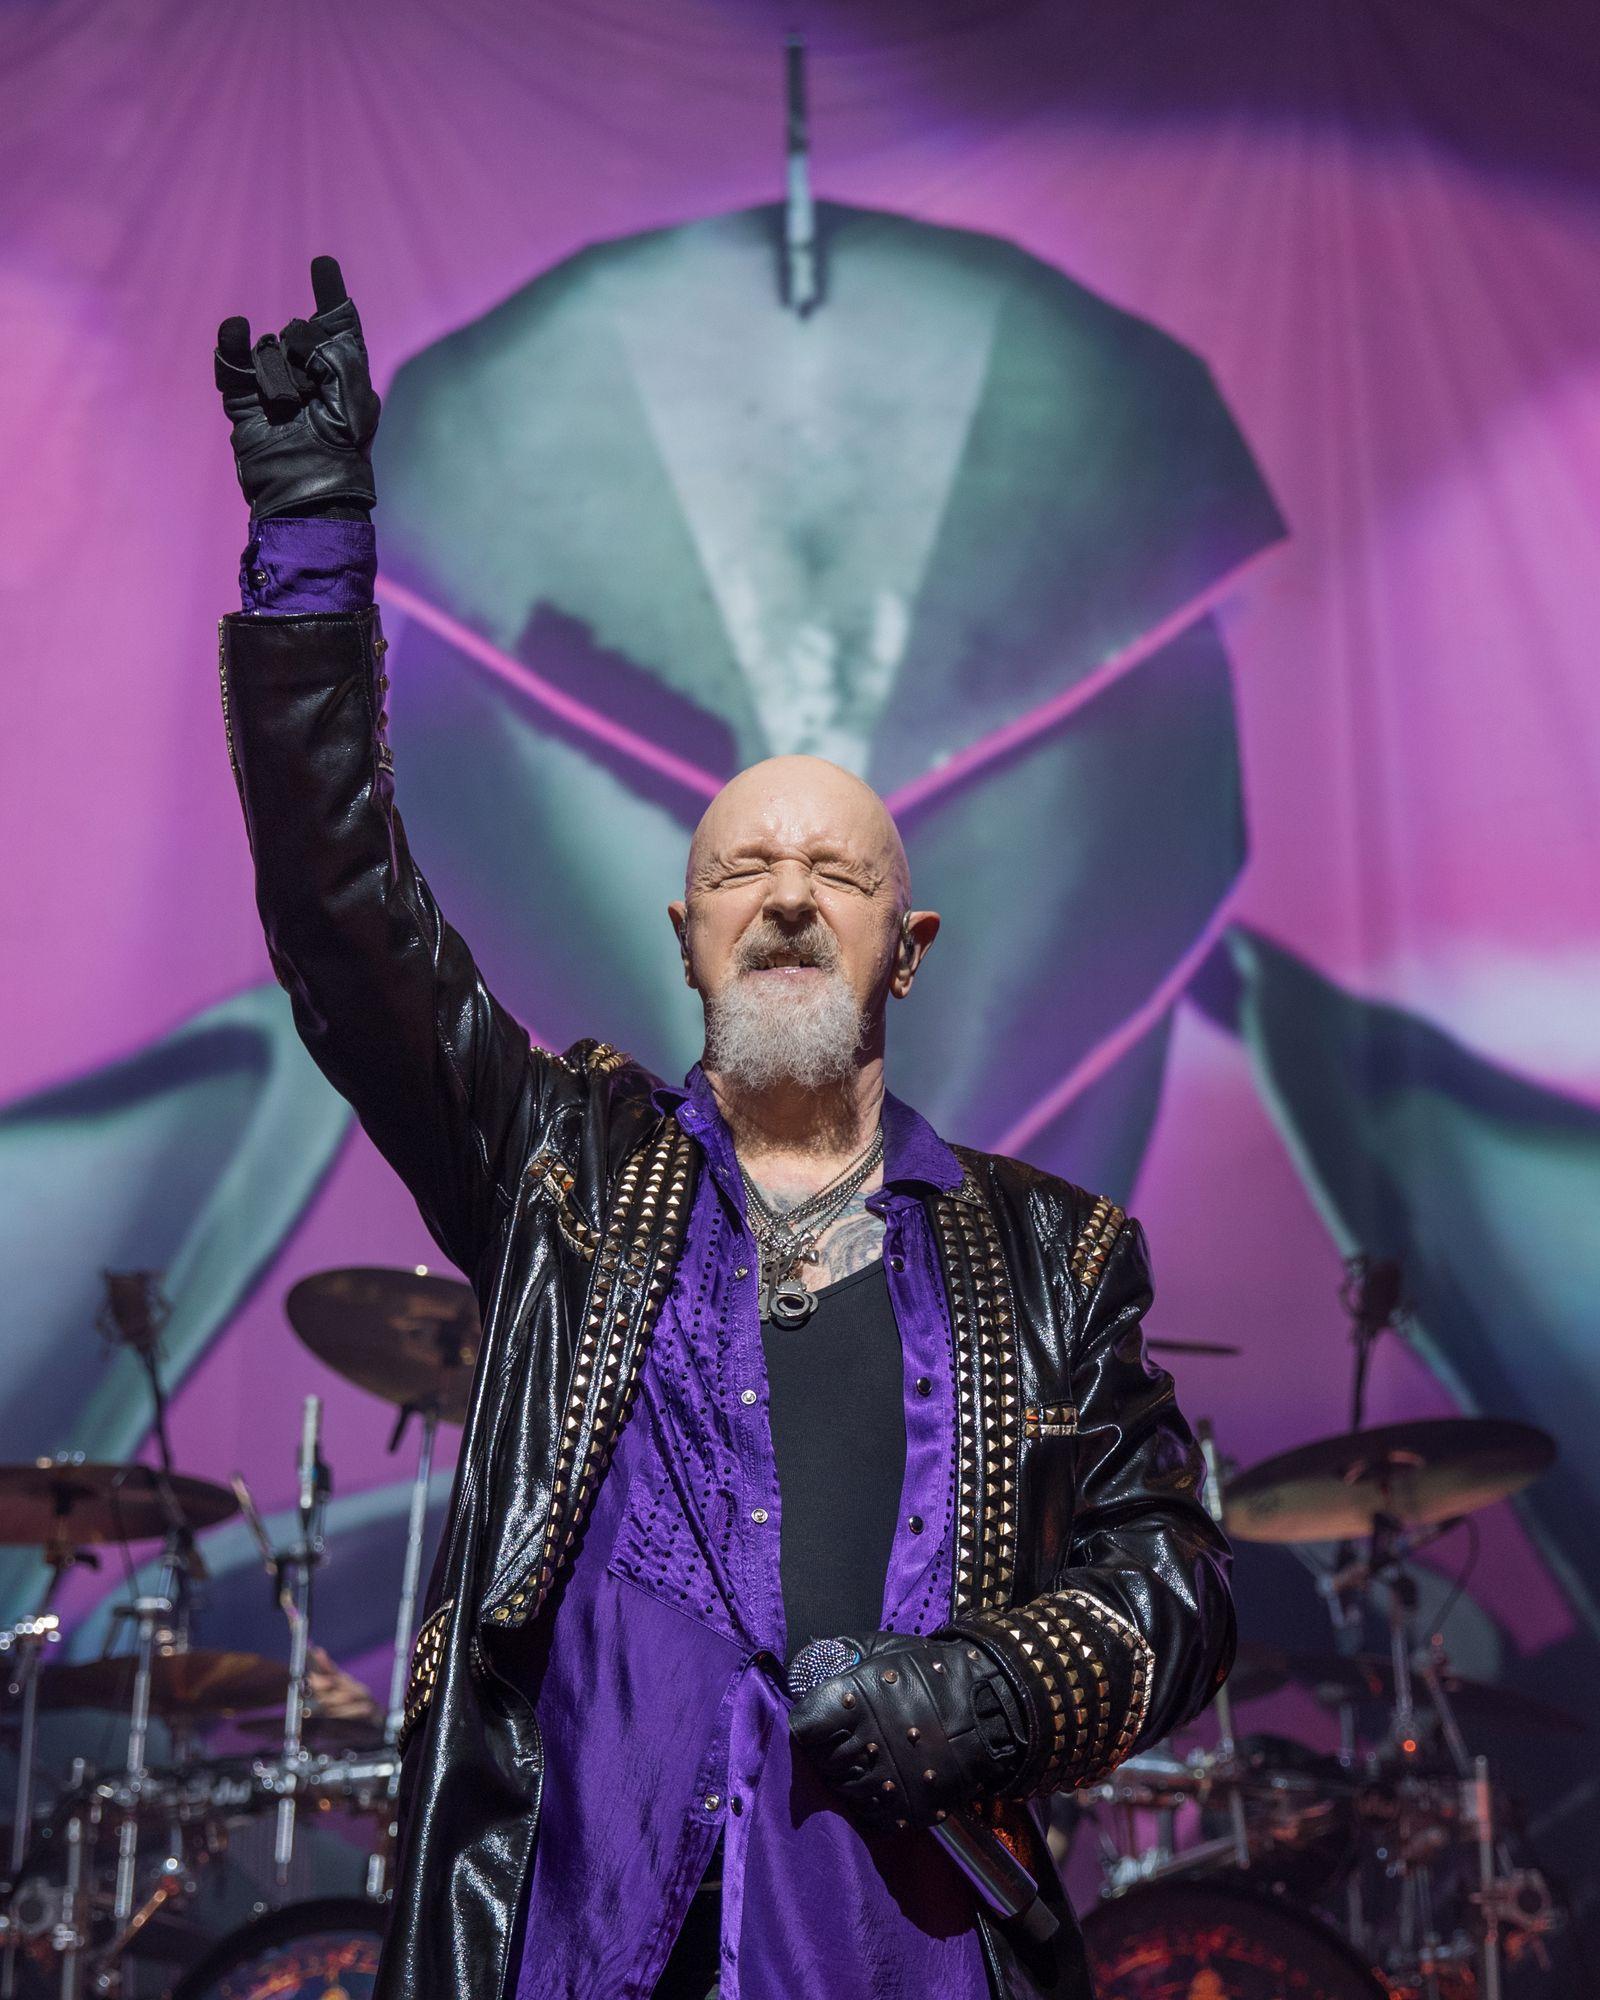 Judas Priest With Uriah Heep In Concert - Austin, TX